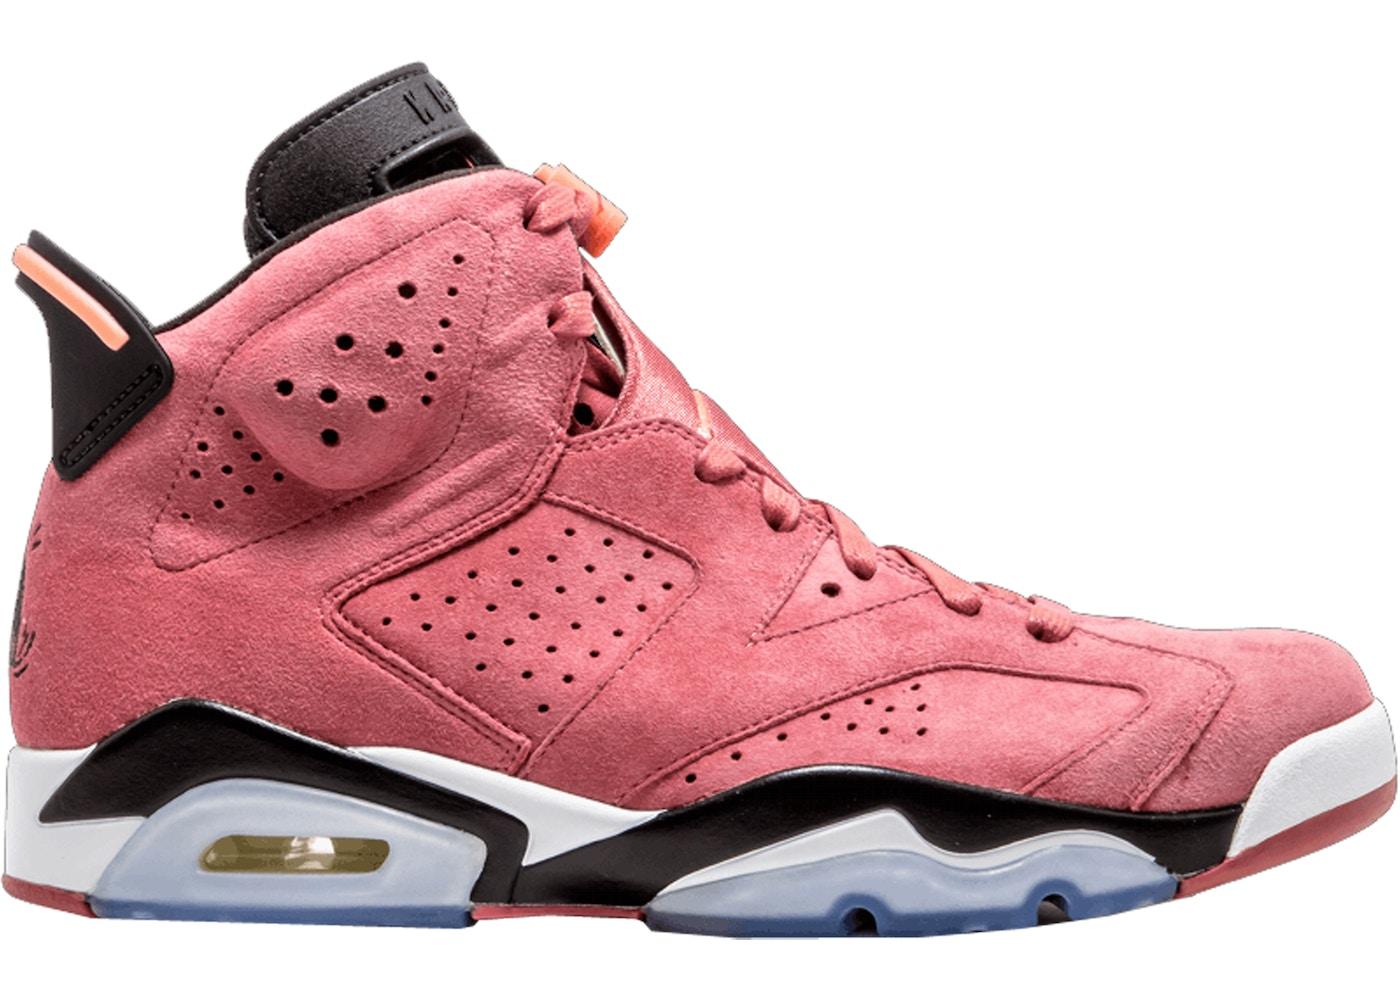 1c52eff43d72 Buy Air Jordan 6 Size 18 Shoes   Deadstock Sneakers